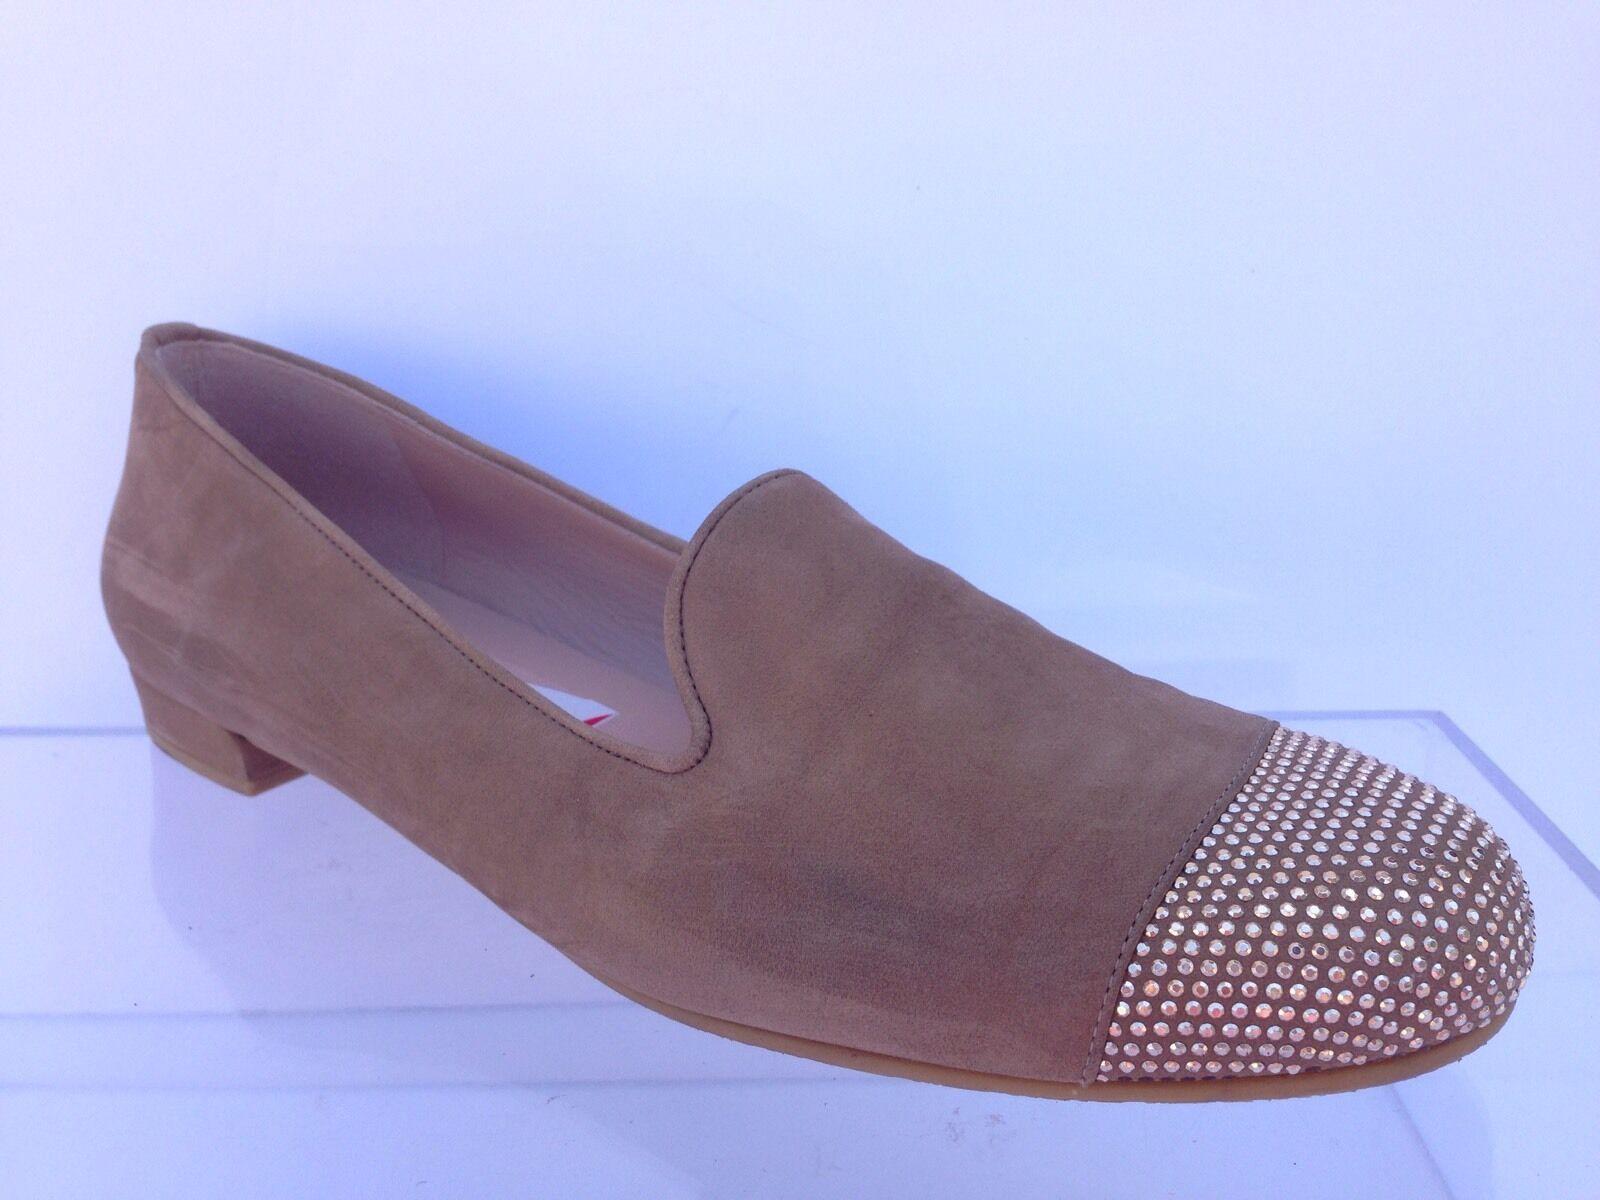 Stuart Weitzman Lingo Damenschuhe Größe 9 N Braun Loafers Schuhes